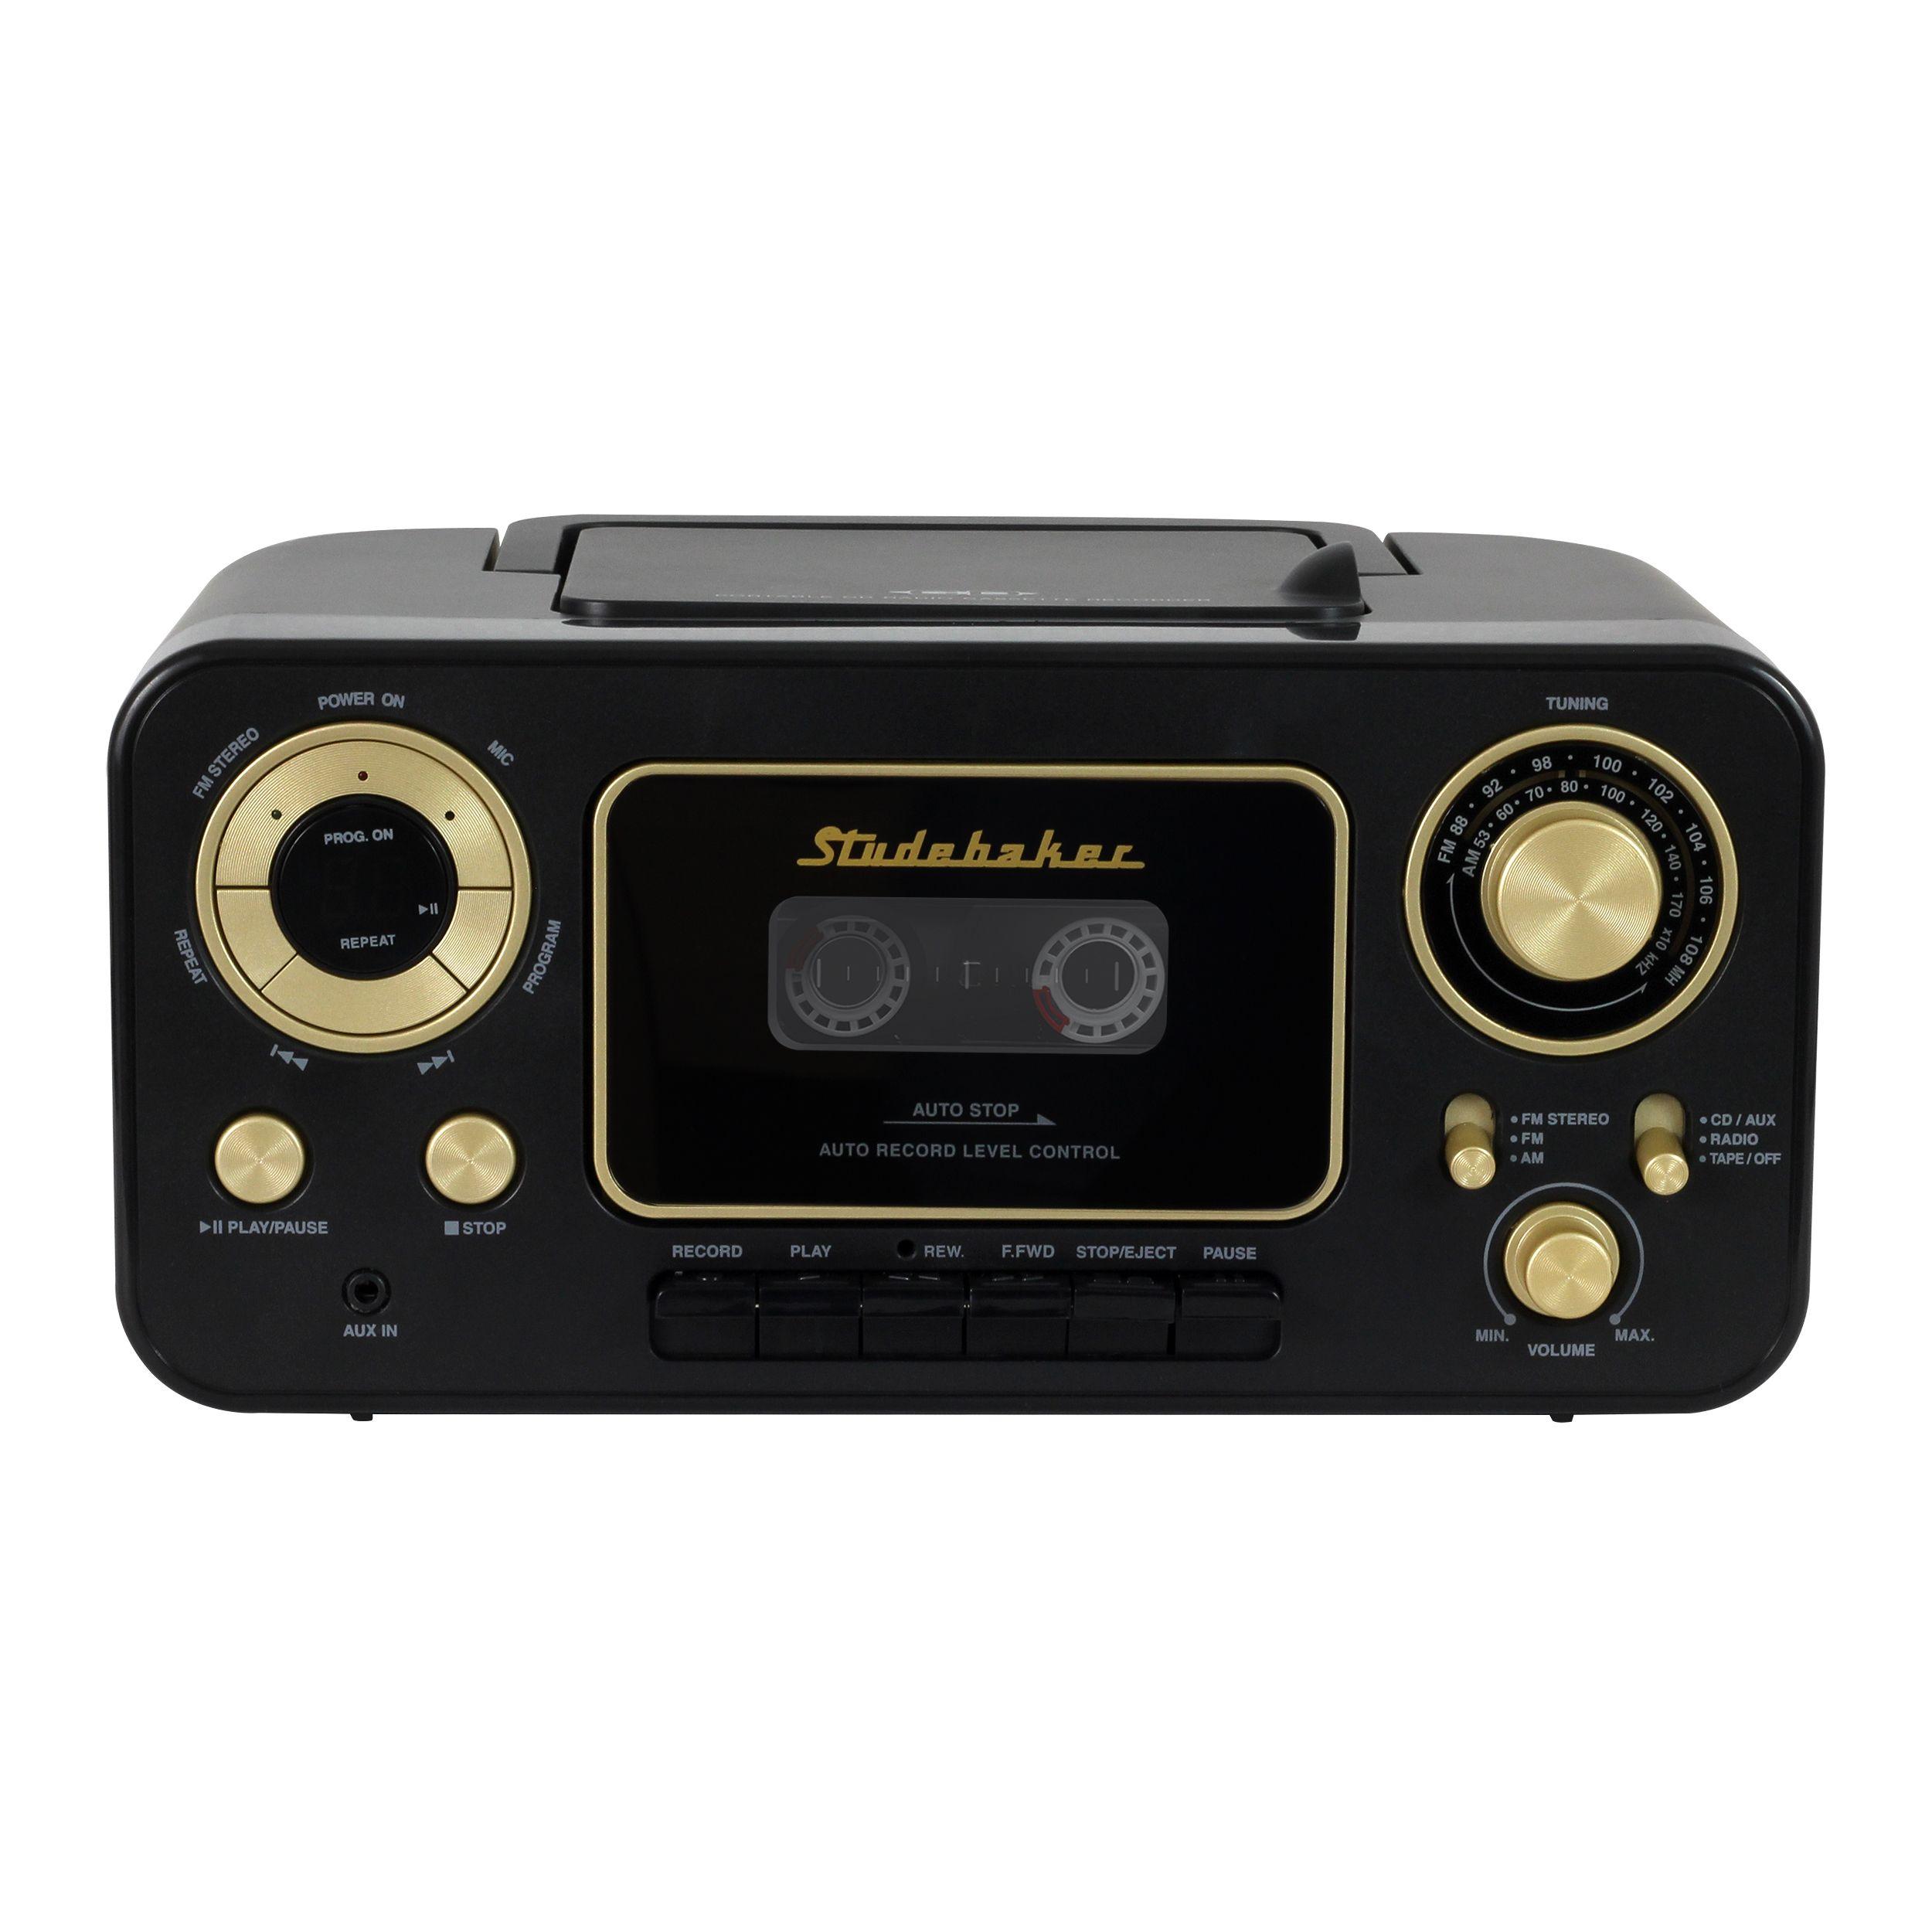 1325324ba2d Studebaker SB2135BG Portable CD Player with AM/FM Radio & Cassette  Player/Recorder (Black & Gold)